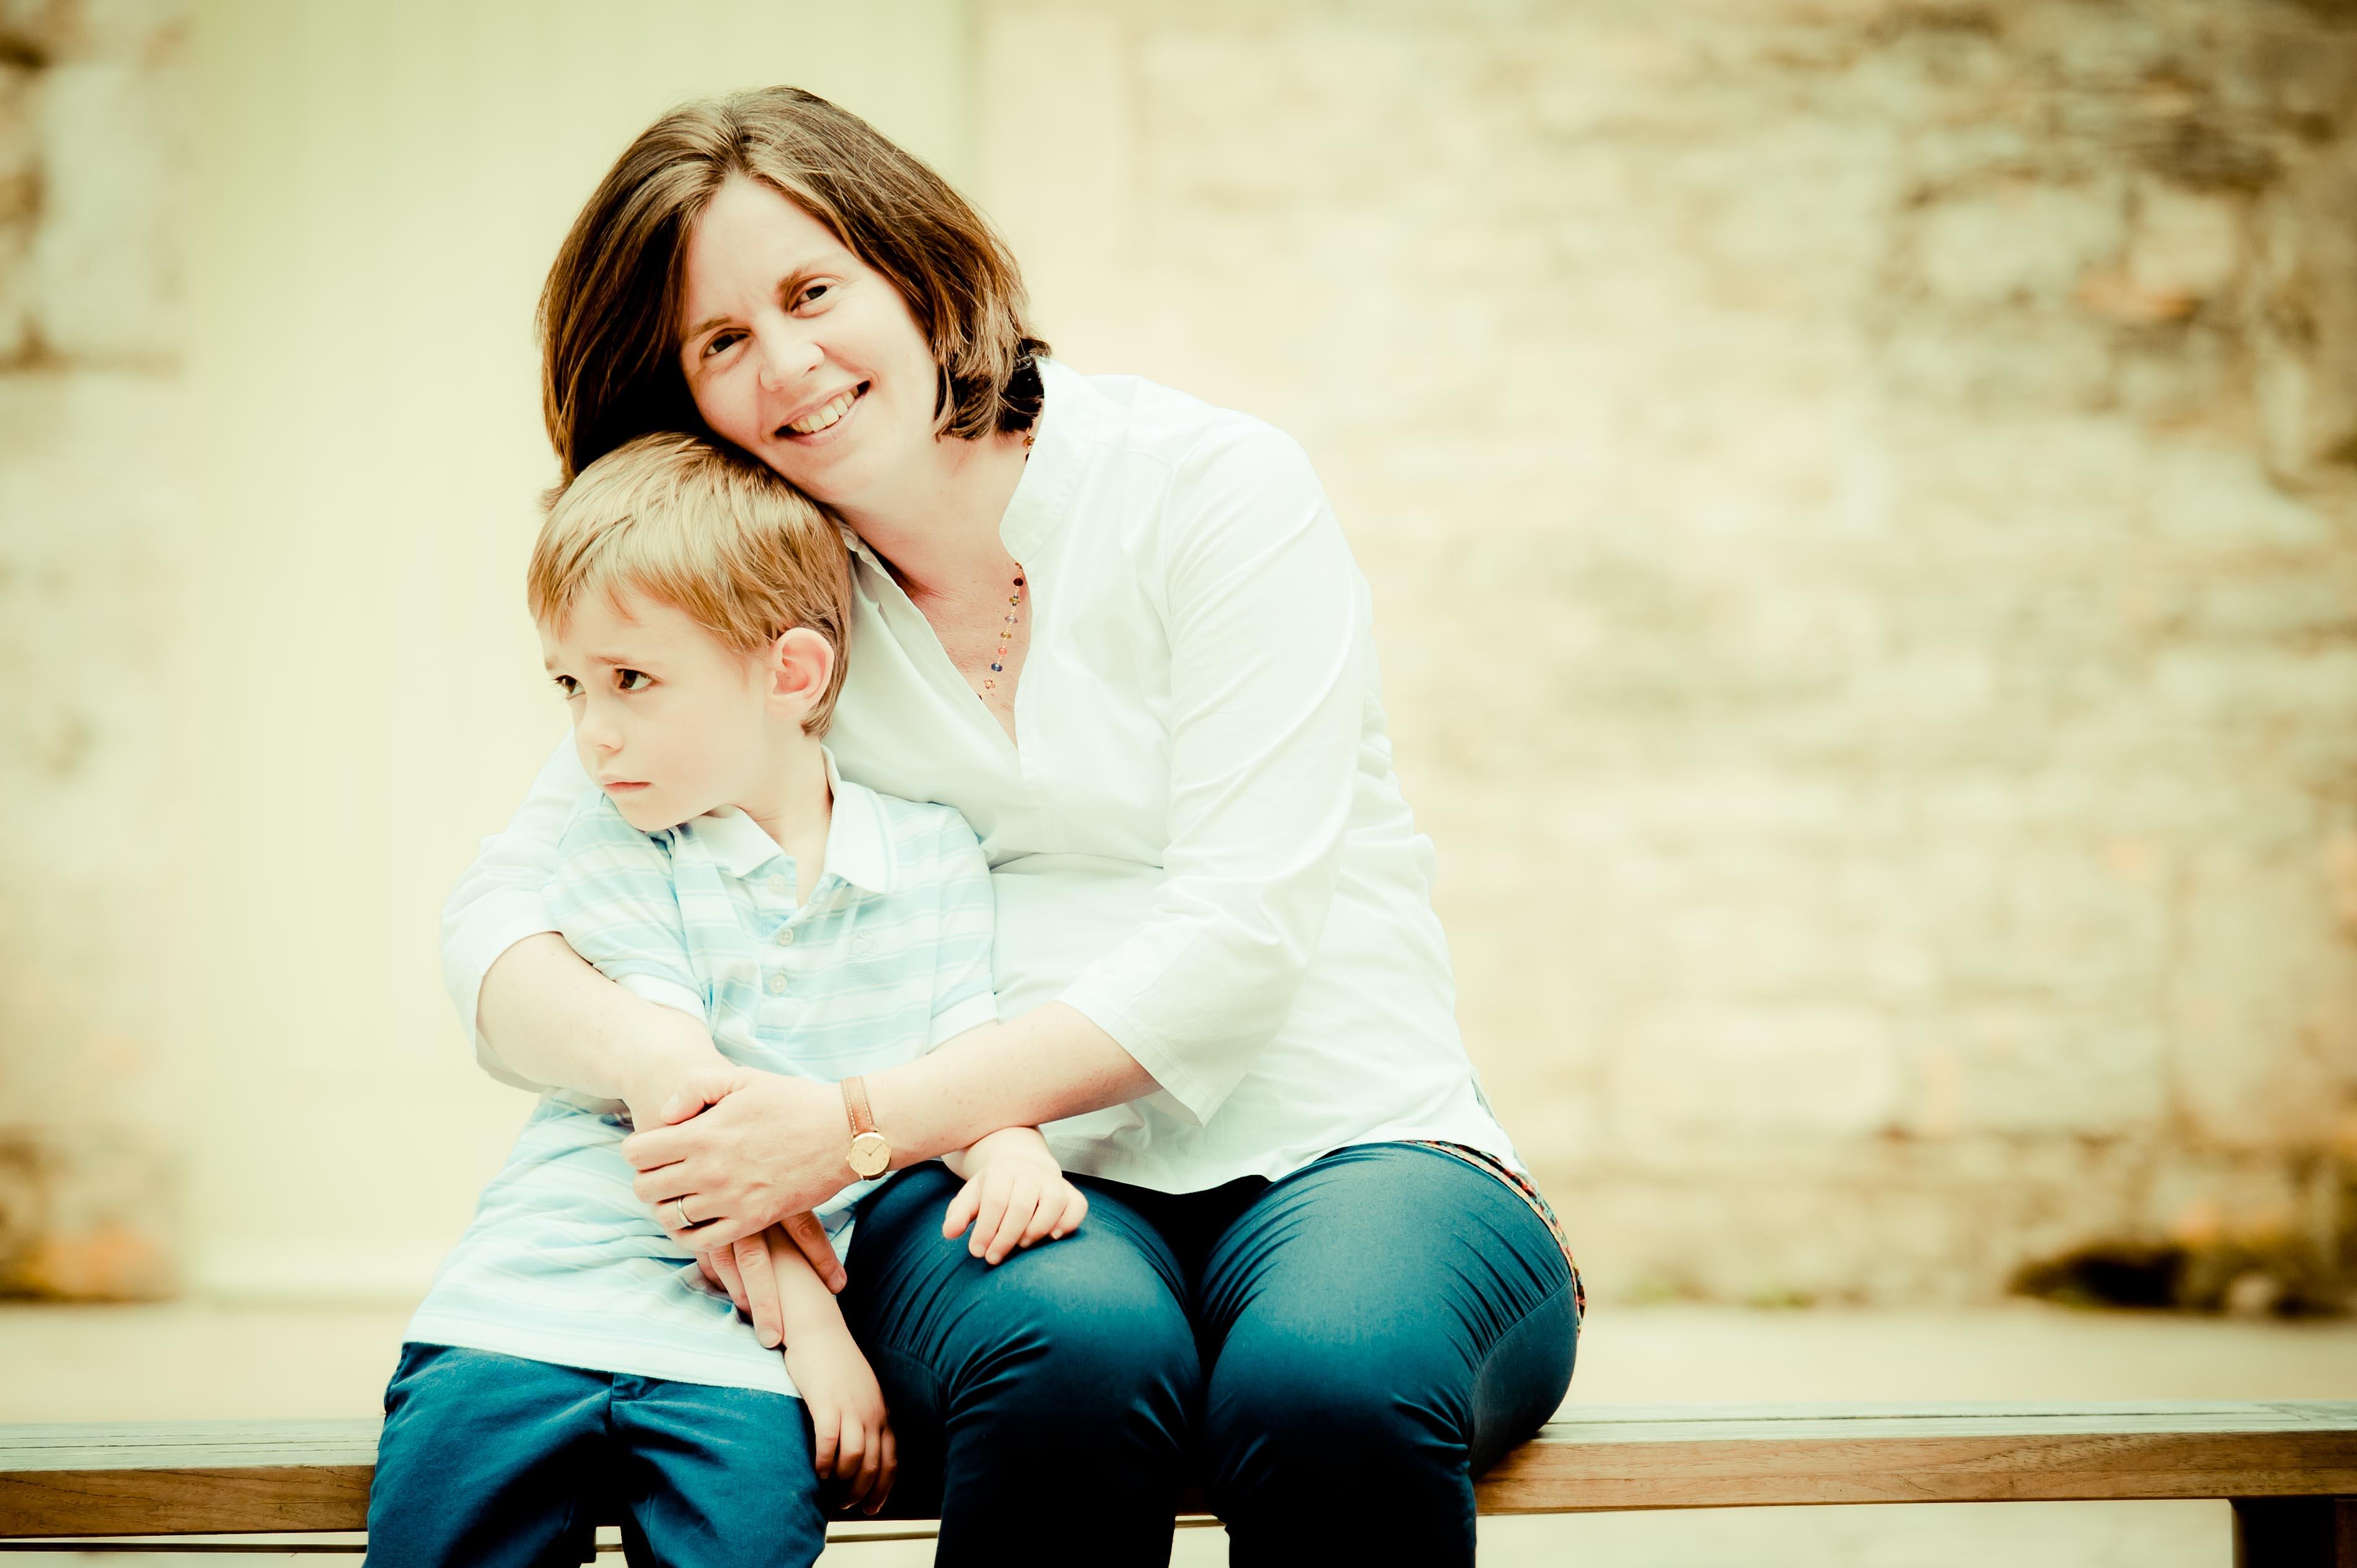 Family Portrait Photographer Cirencester